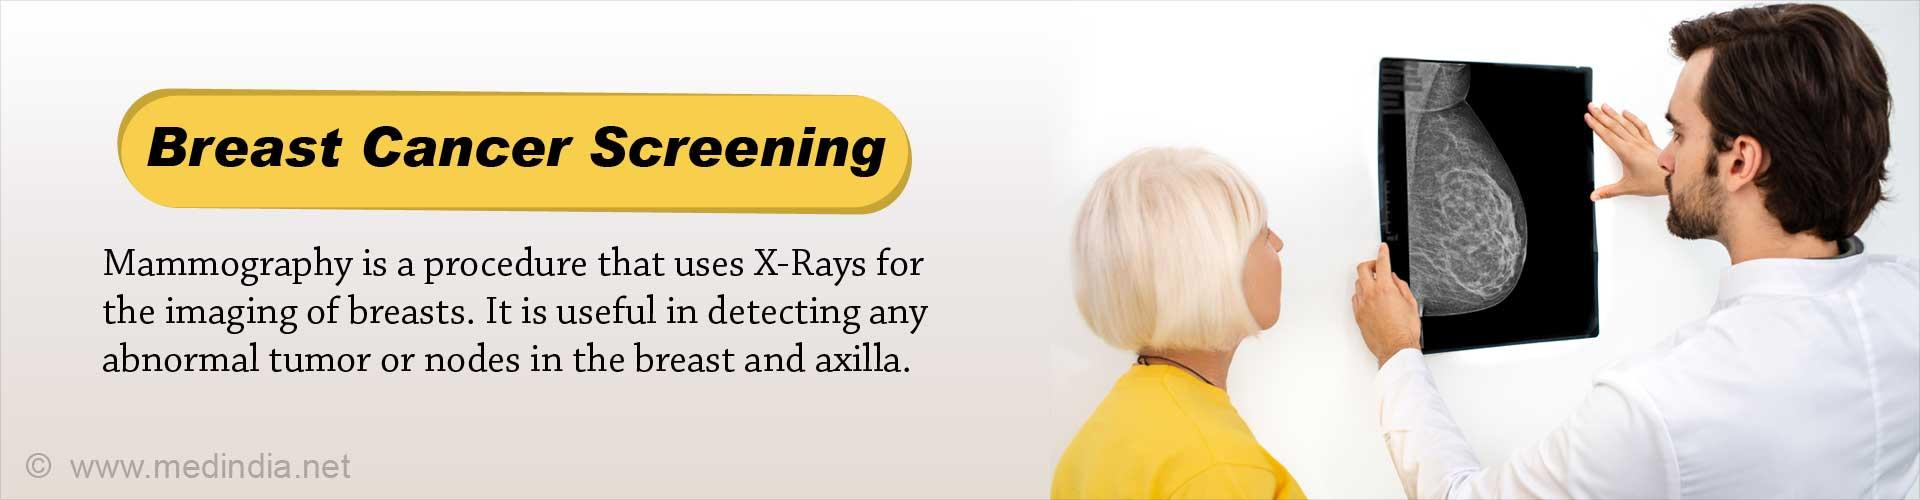 Breast Cancer Screening using Mammogram